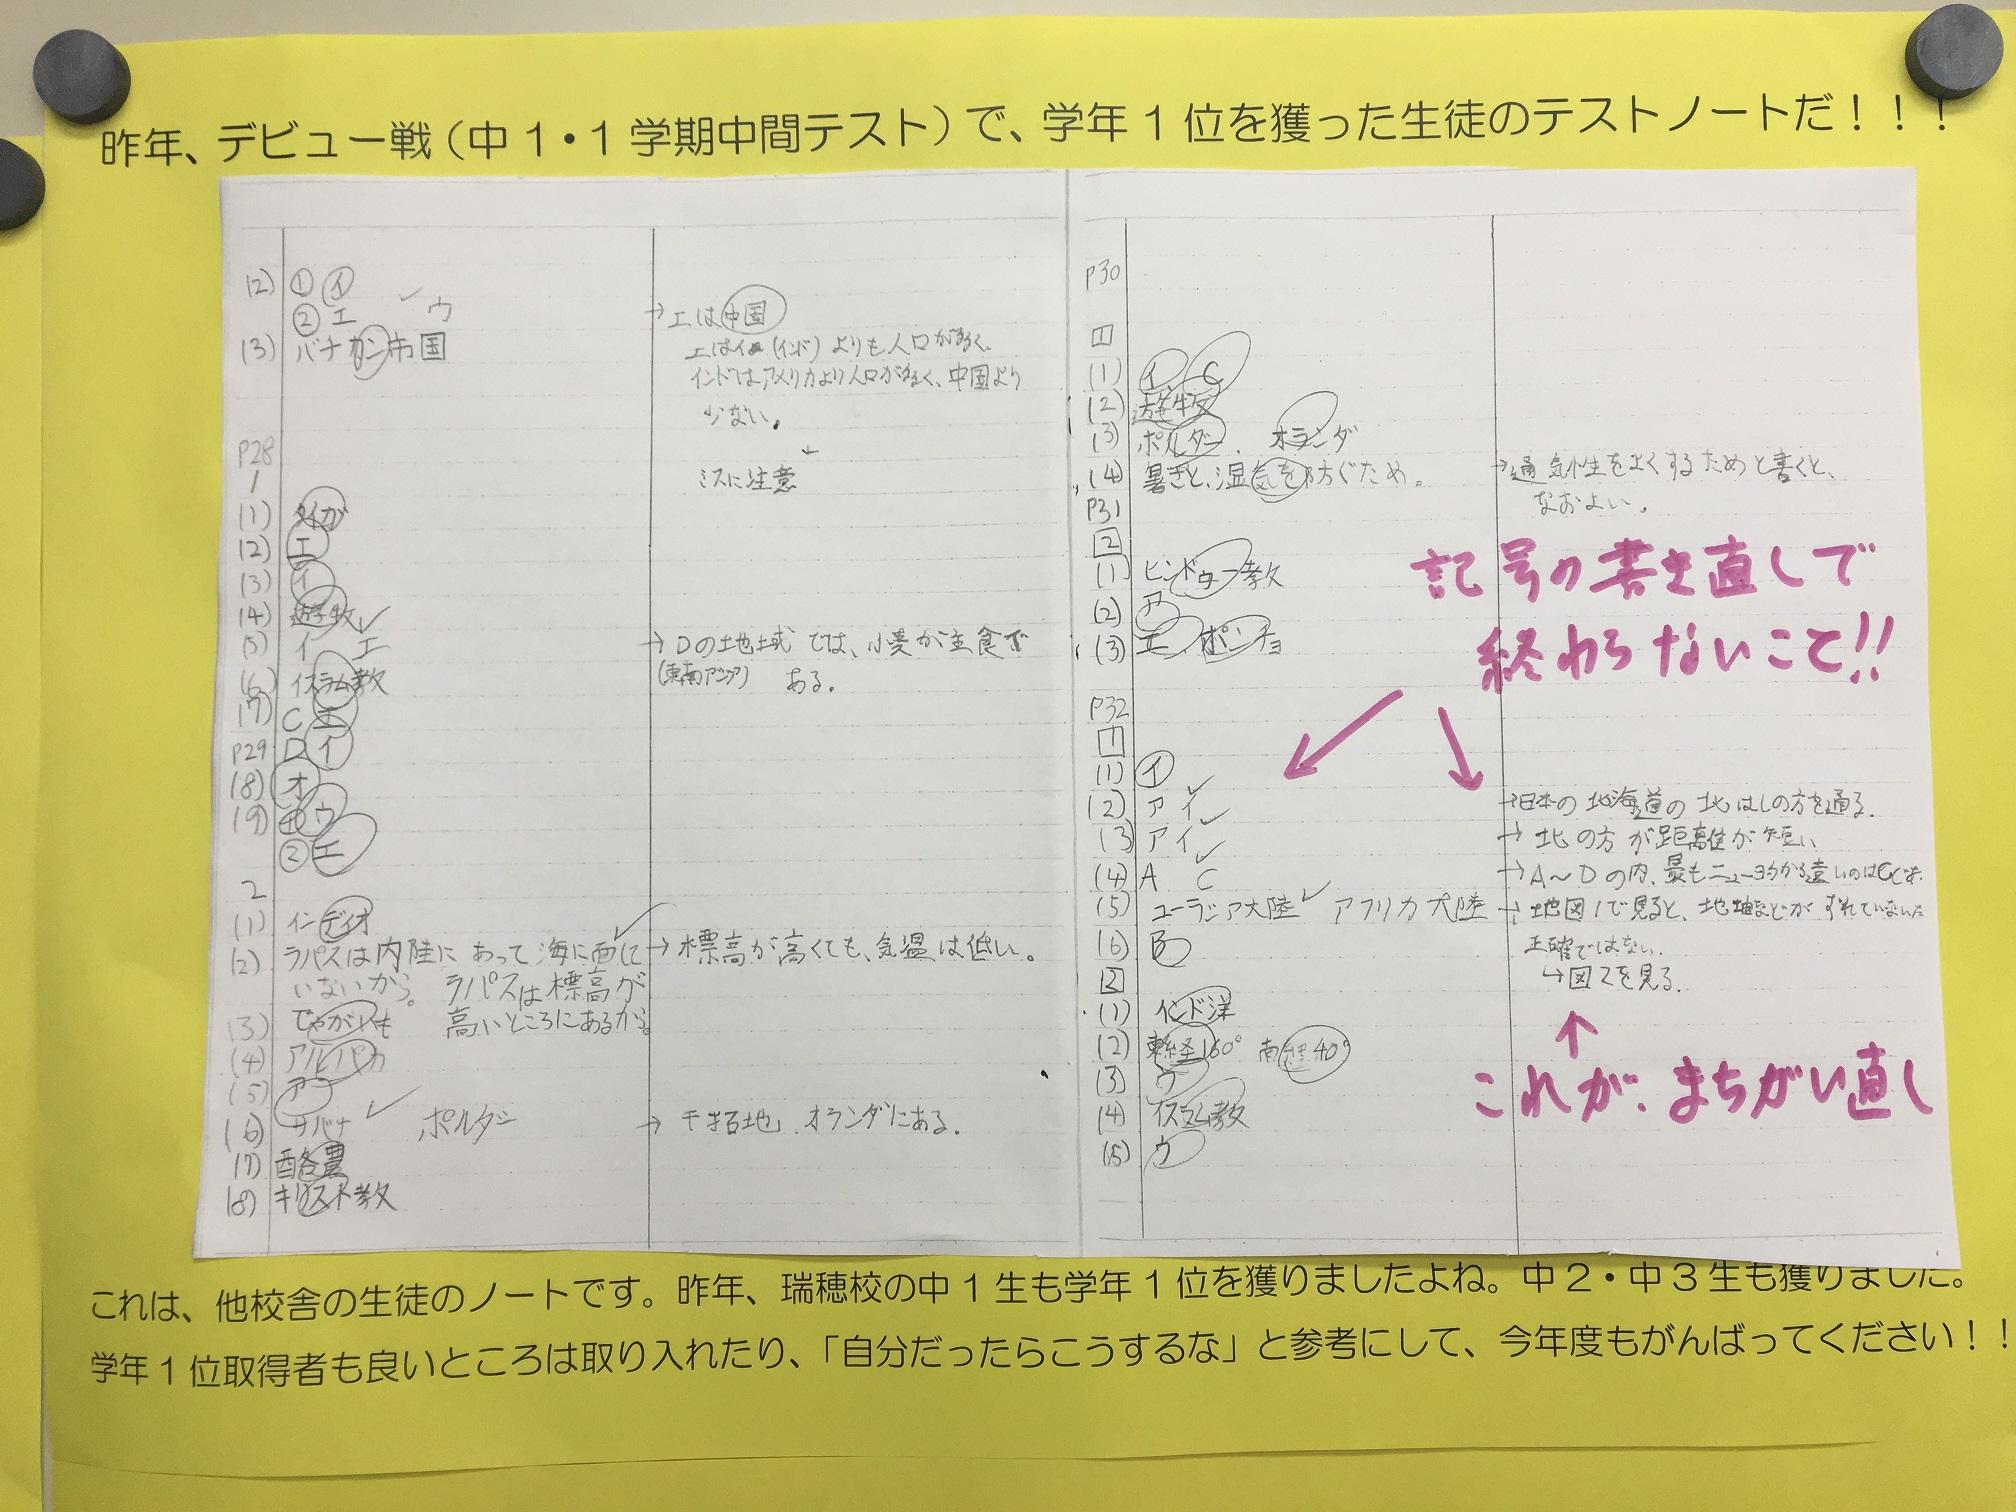 IMG_0878.JPG